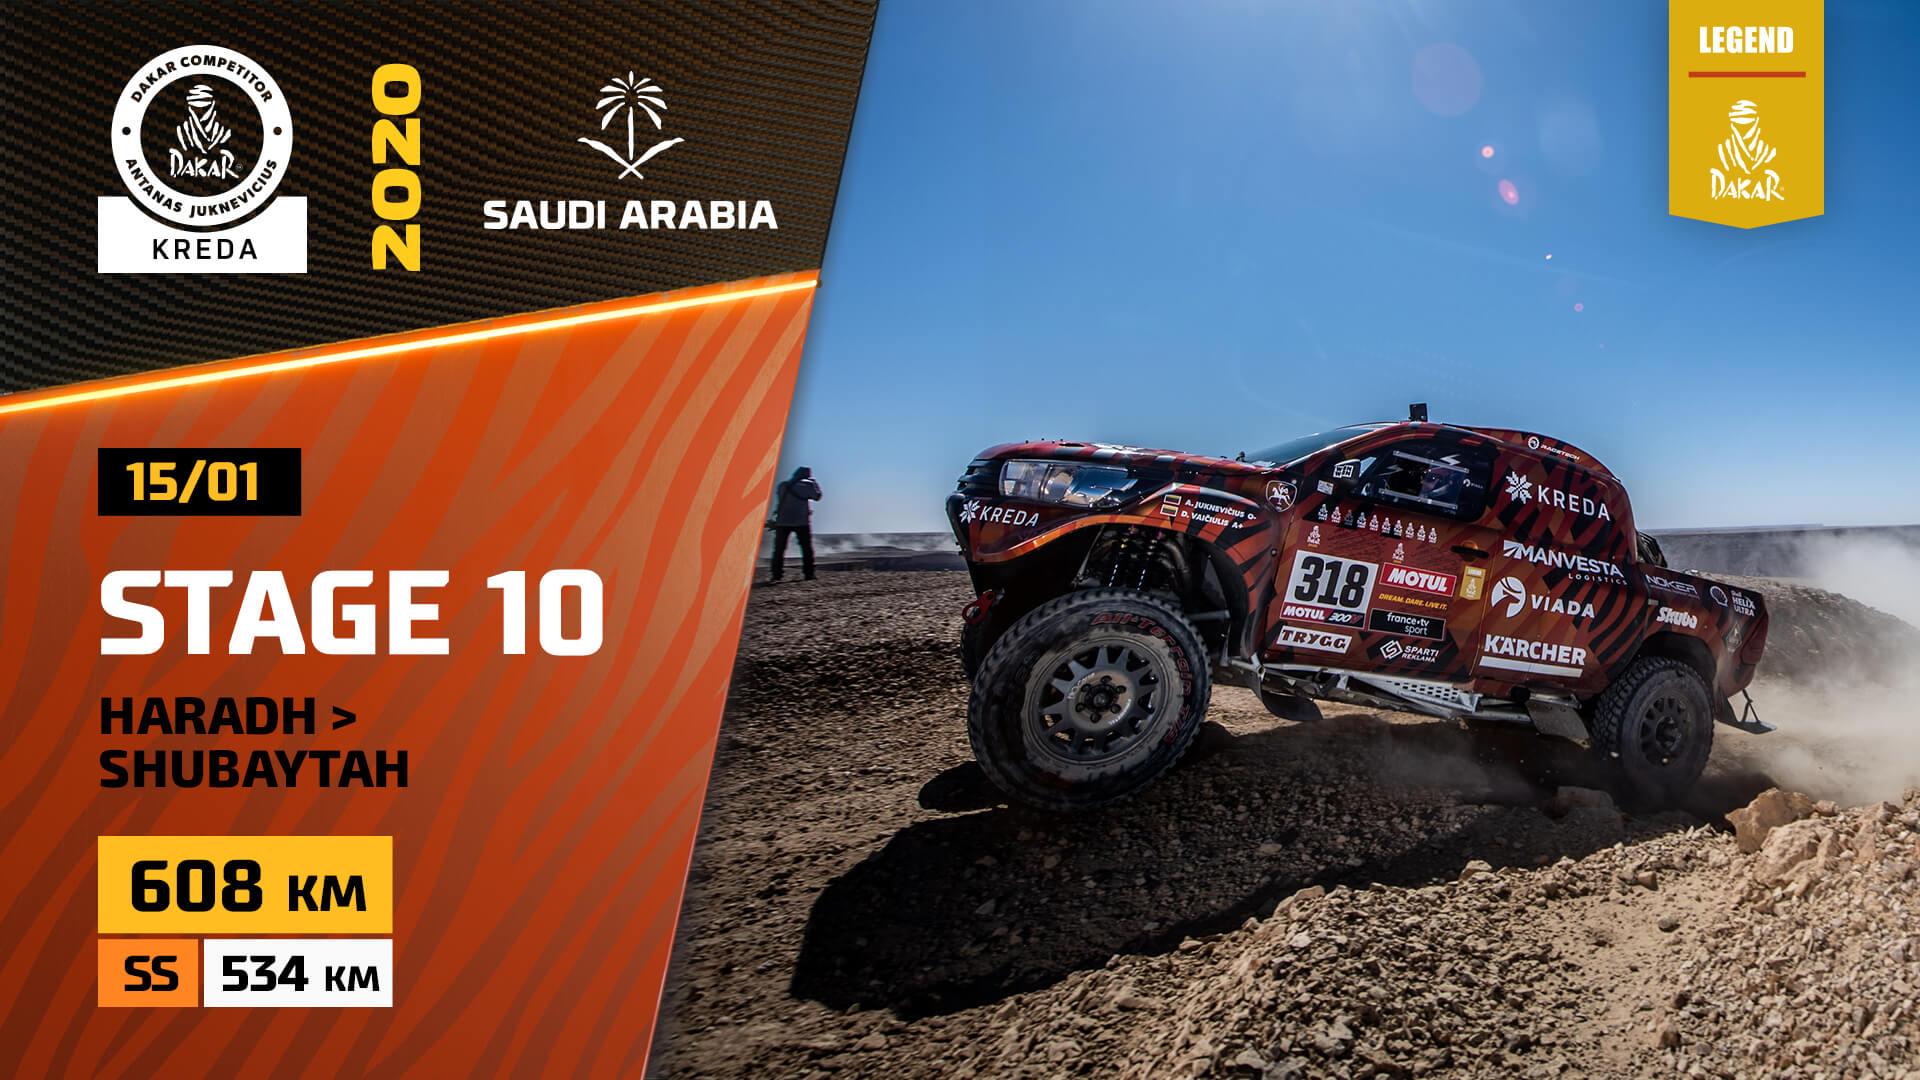 Dakar Rally 2020. Stage 10 Highlights Haradh – Shubaytah in Saudi Arabia